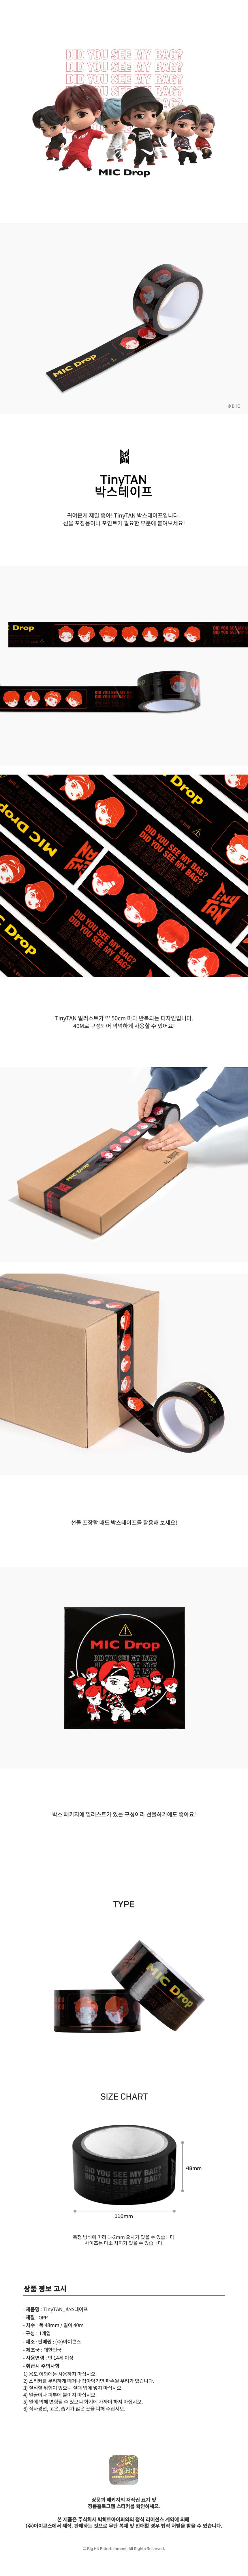 [BTS] TinyTAN Box Tape-holiholic.com